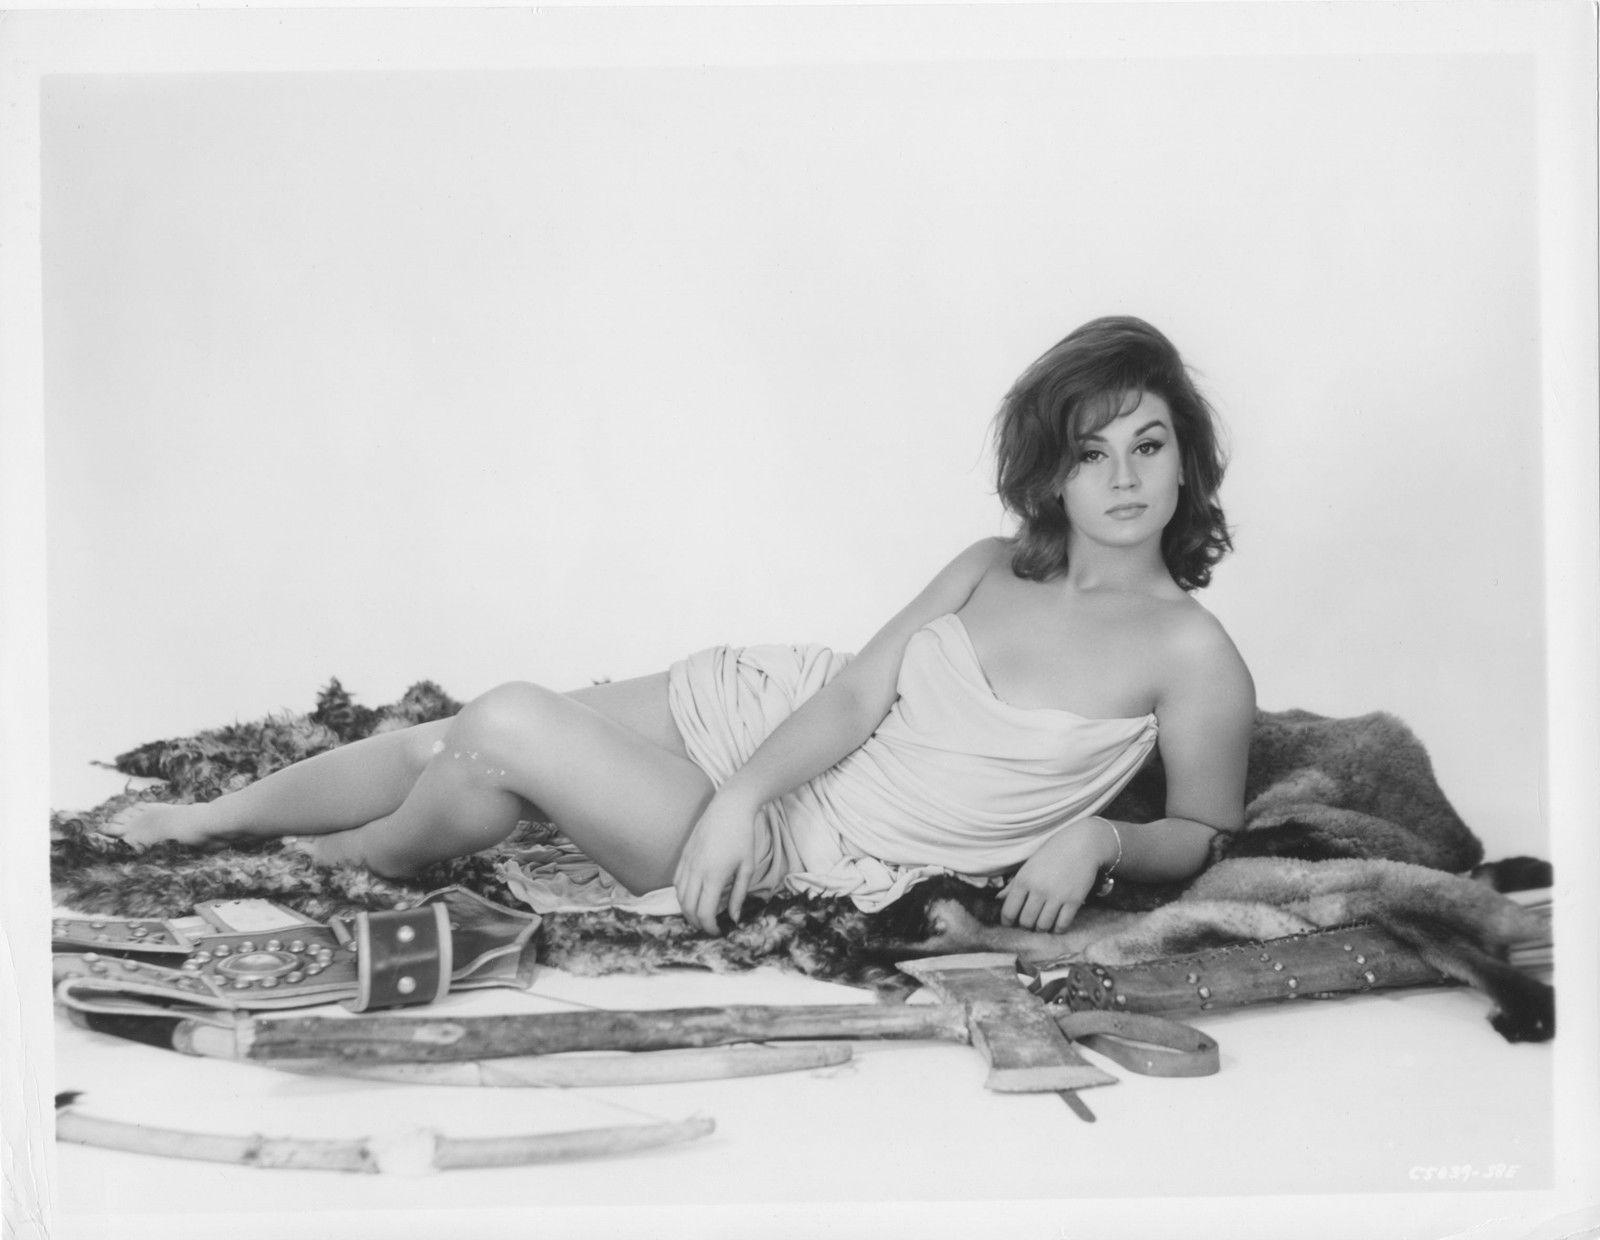 Liana Orfei (born 1937)